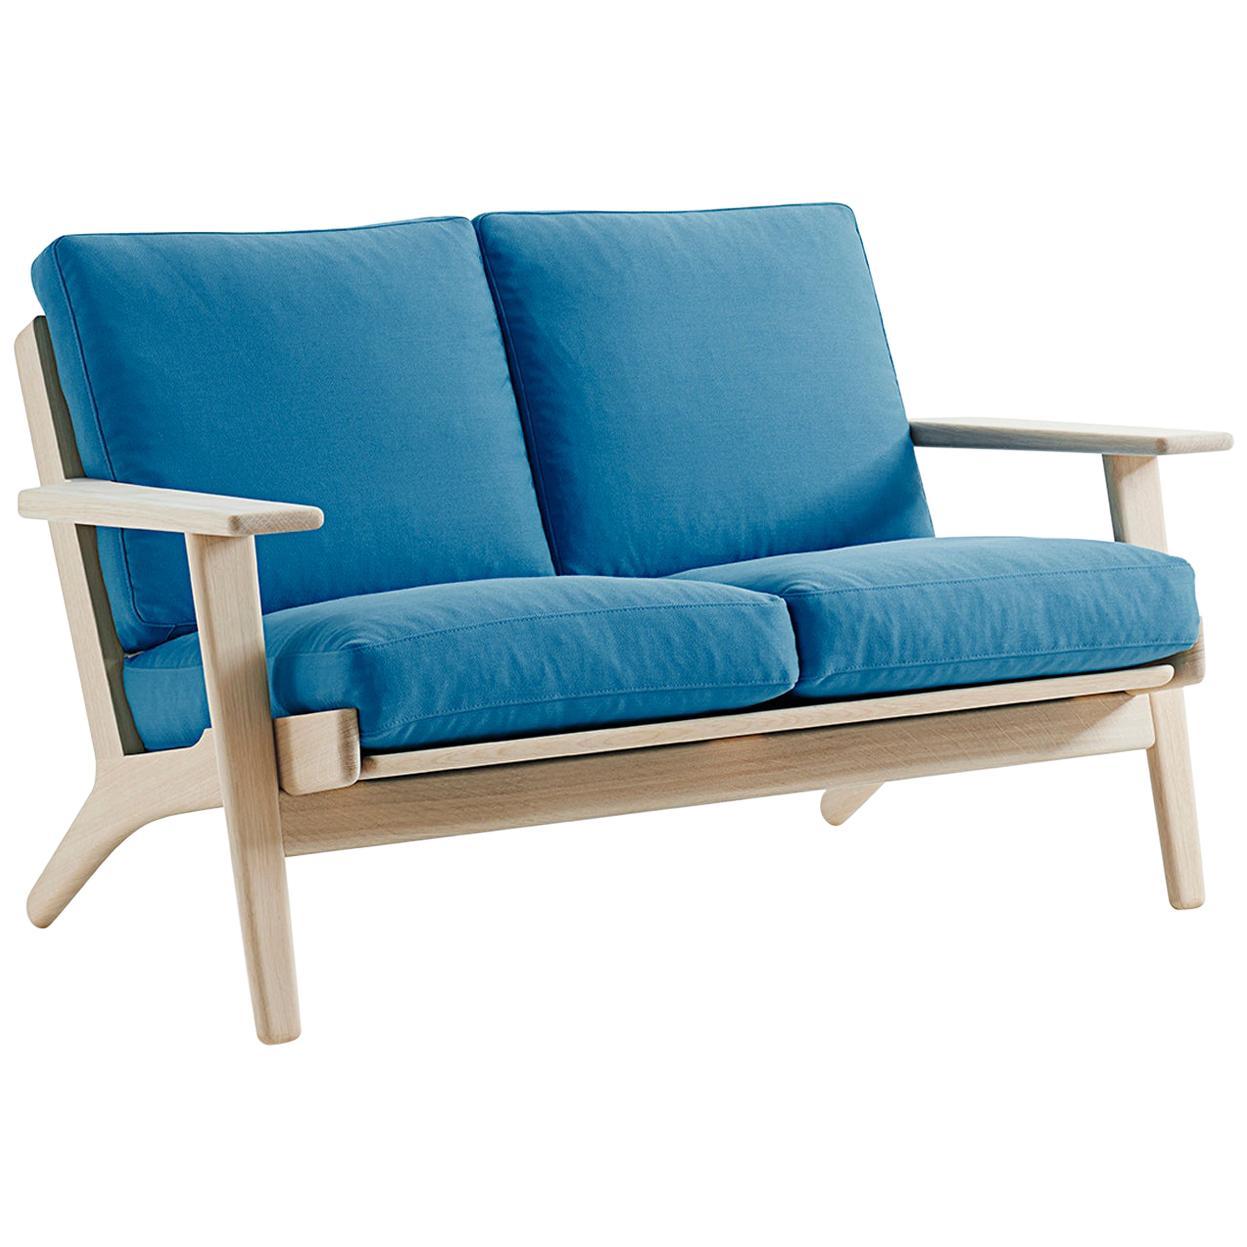 Hans Wegner GE-290/2 Sofa